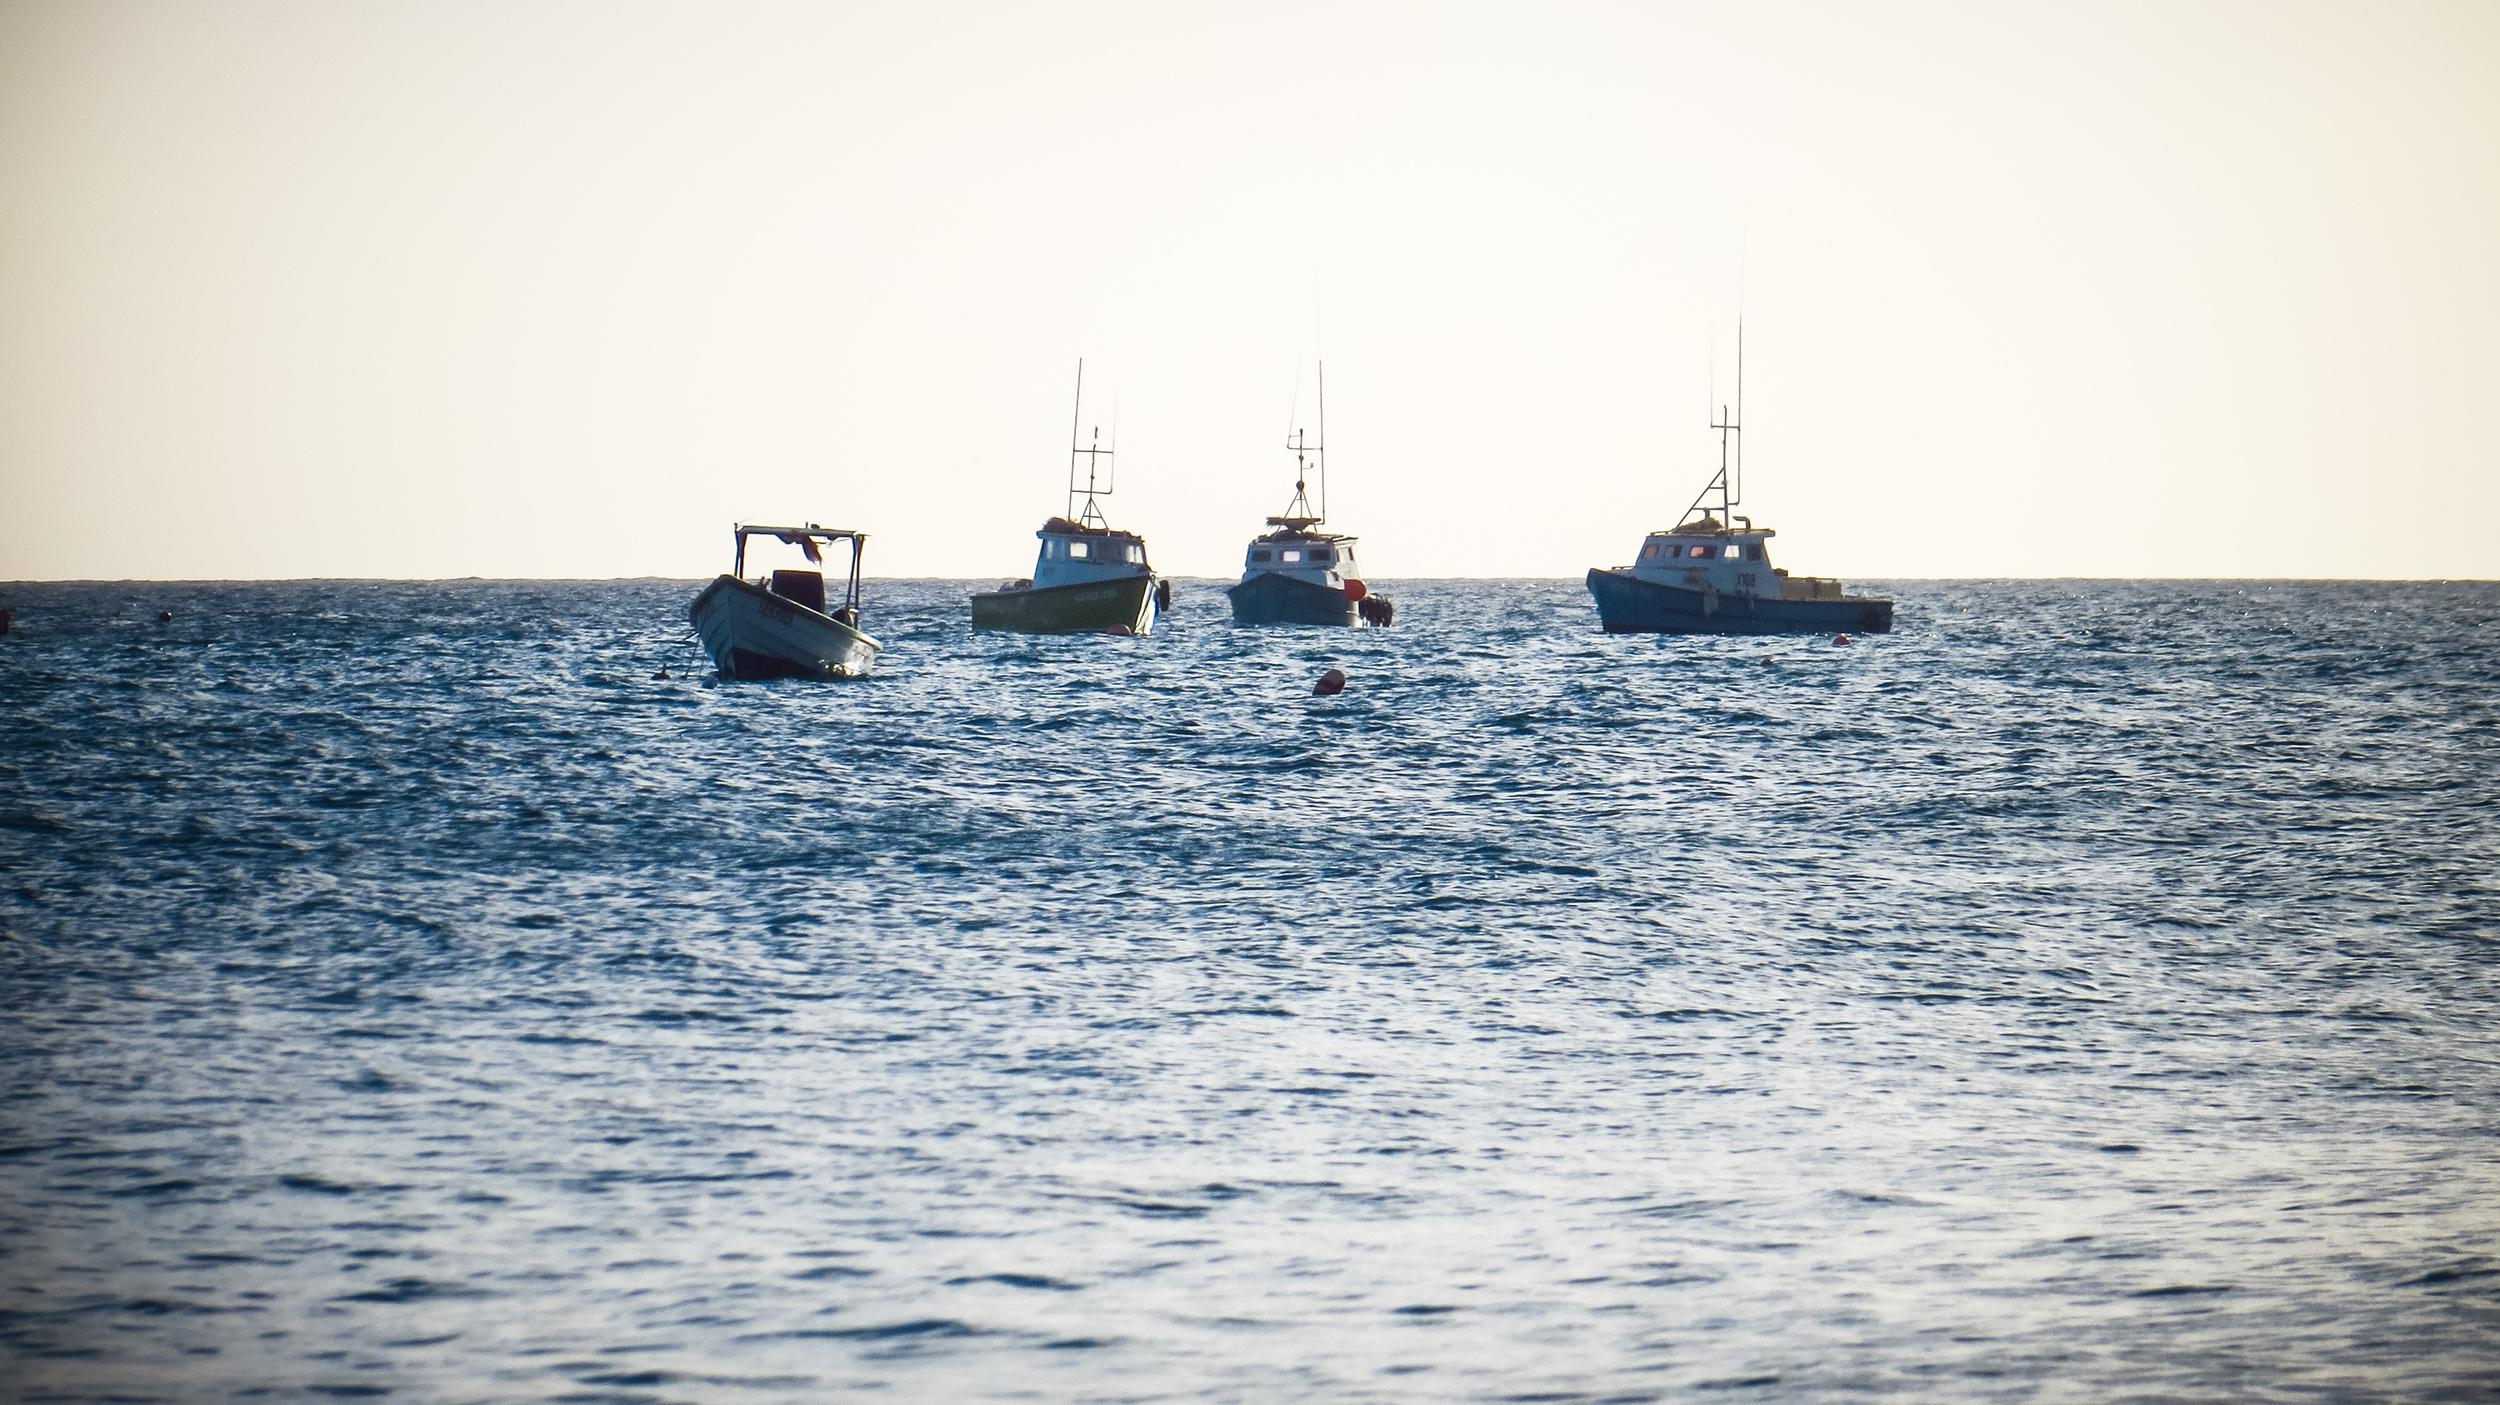 The fishing boats at Oistins